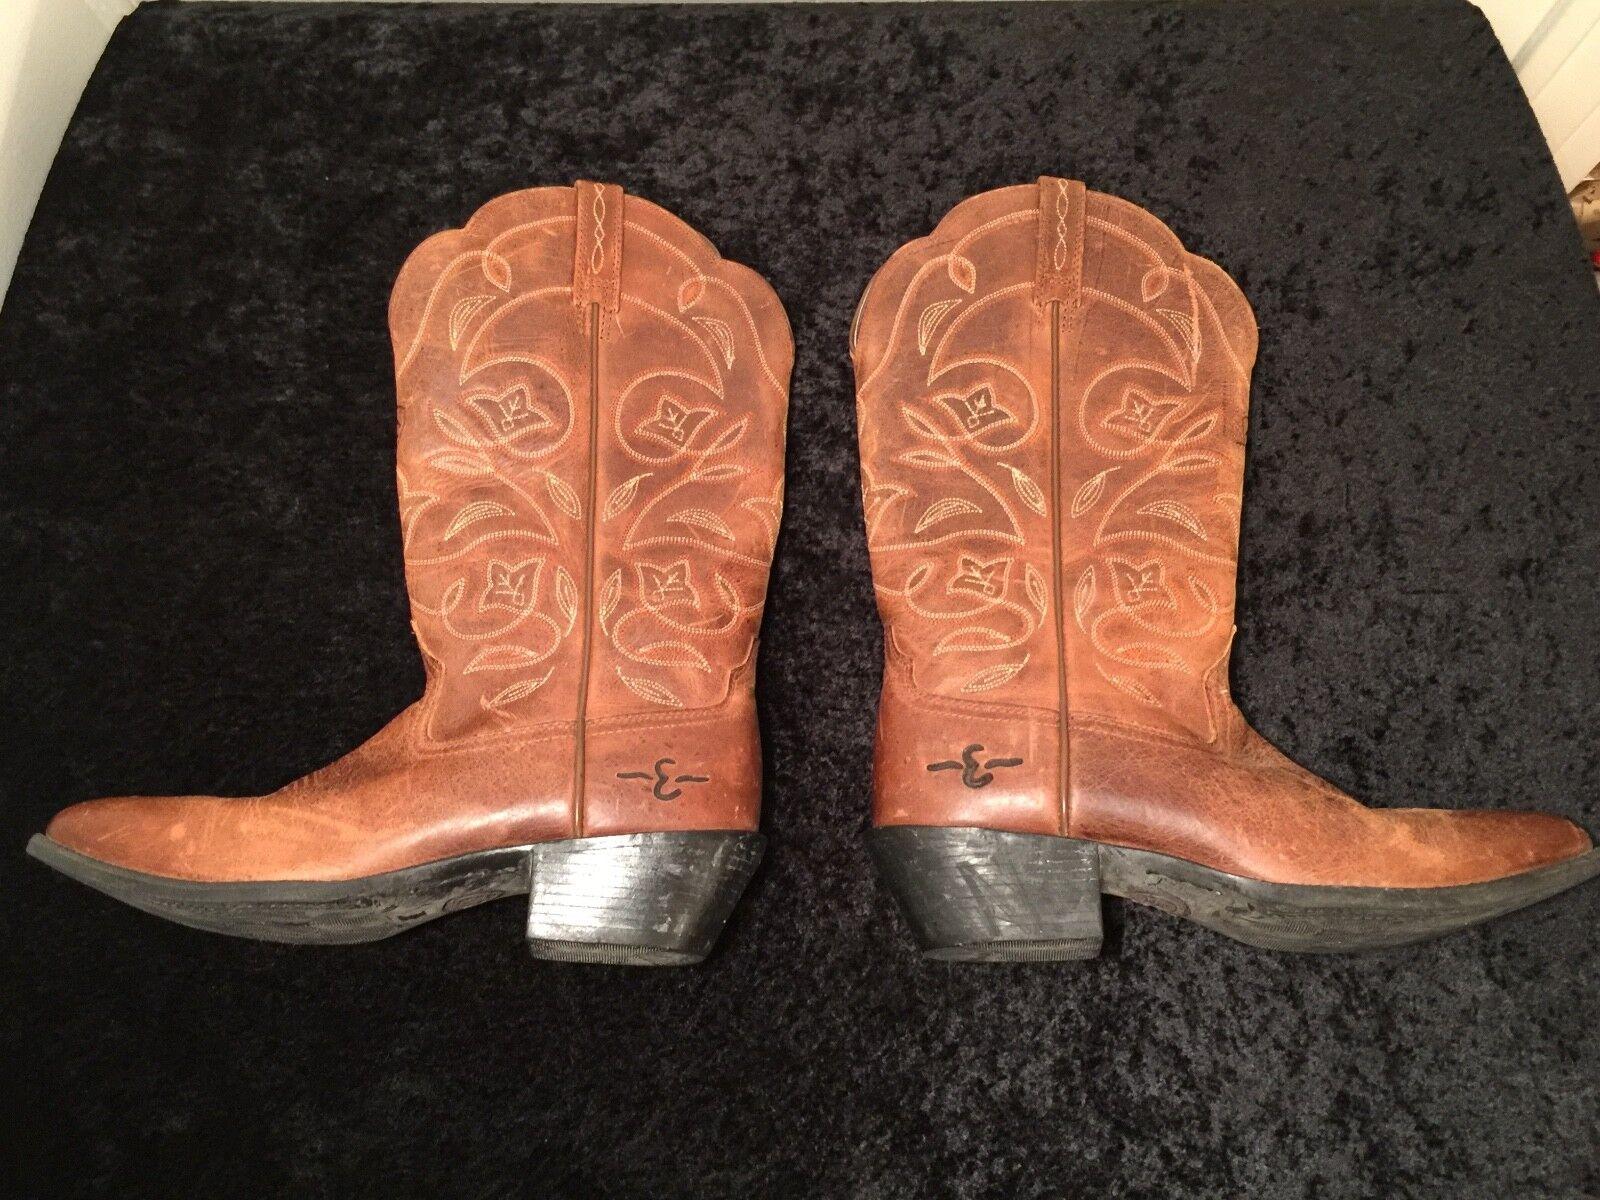 ARIAT 15702 Heritage Russet Braun Leder Floral Pattern Cowboy Stiefel Größe 9.5